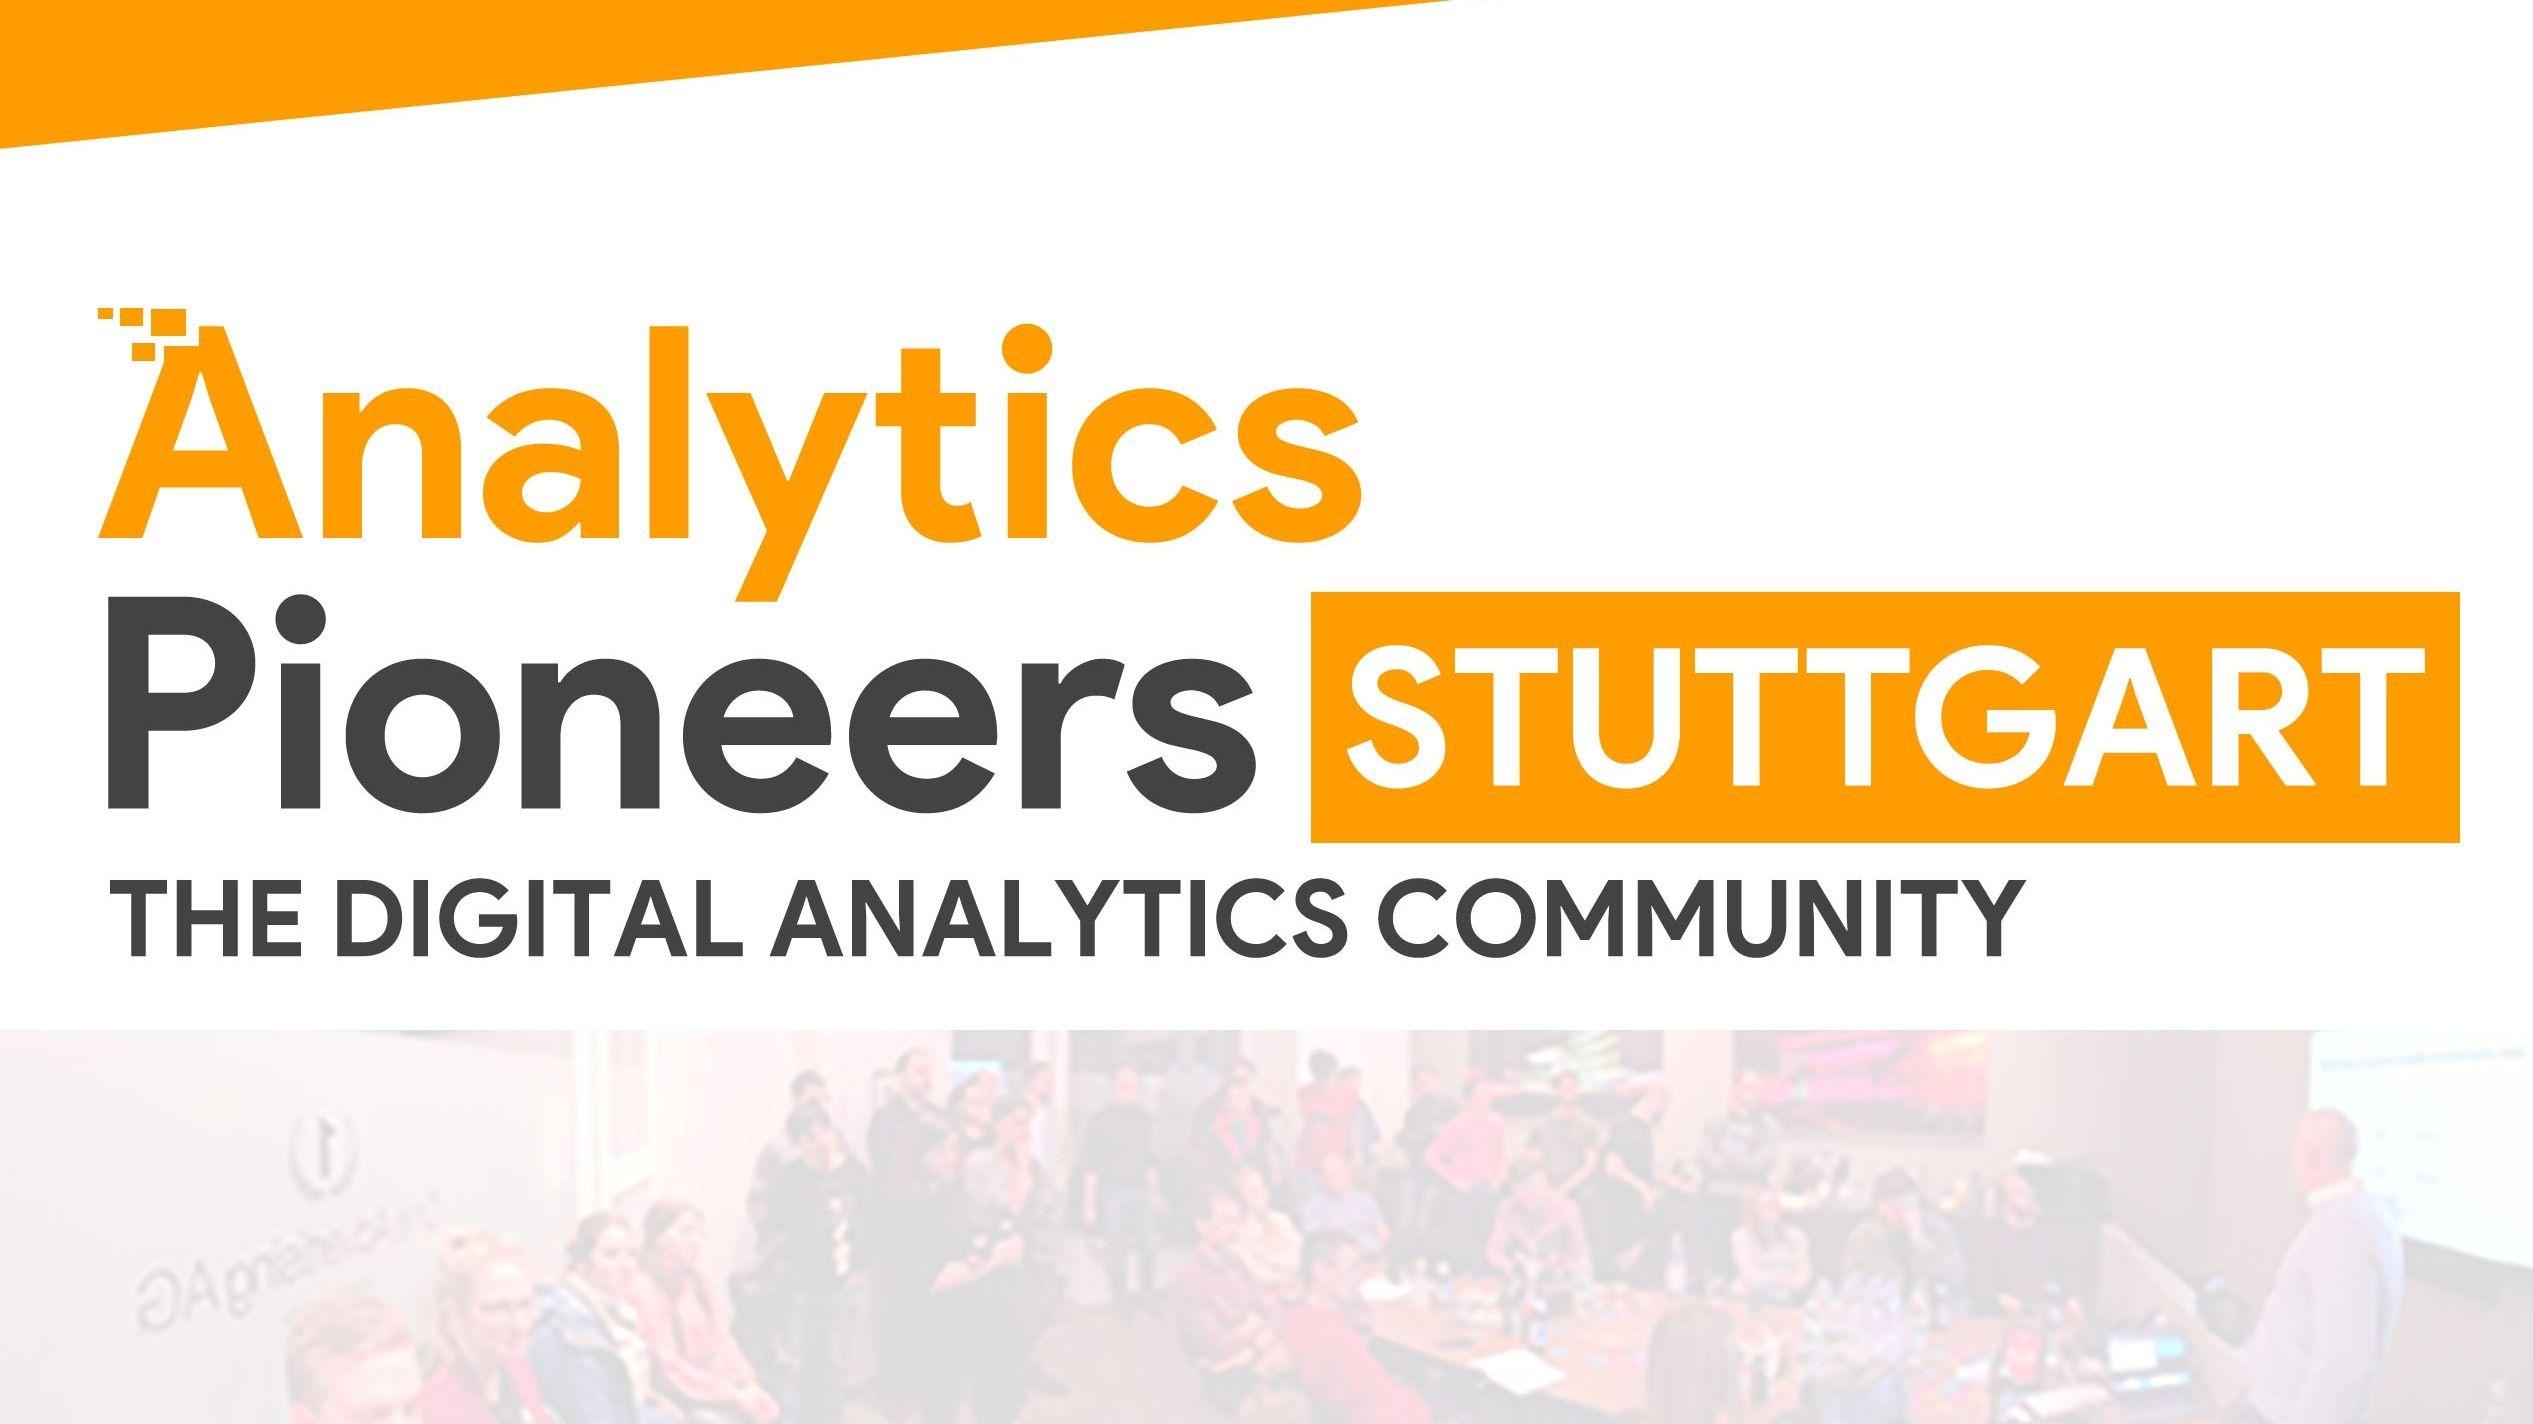 Analytics Pioneers Meetup - STUTTGART #1 - September 2020